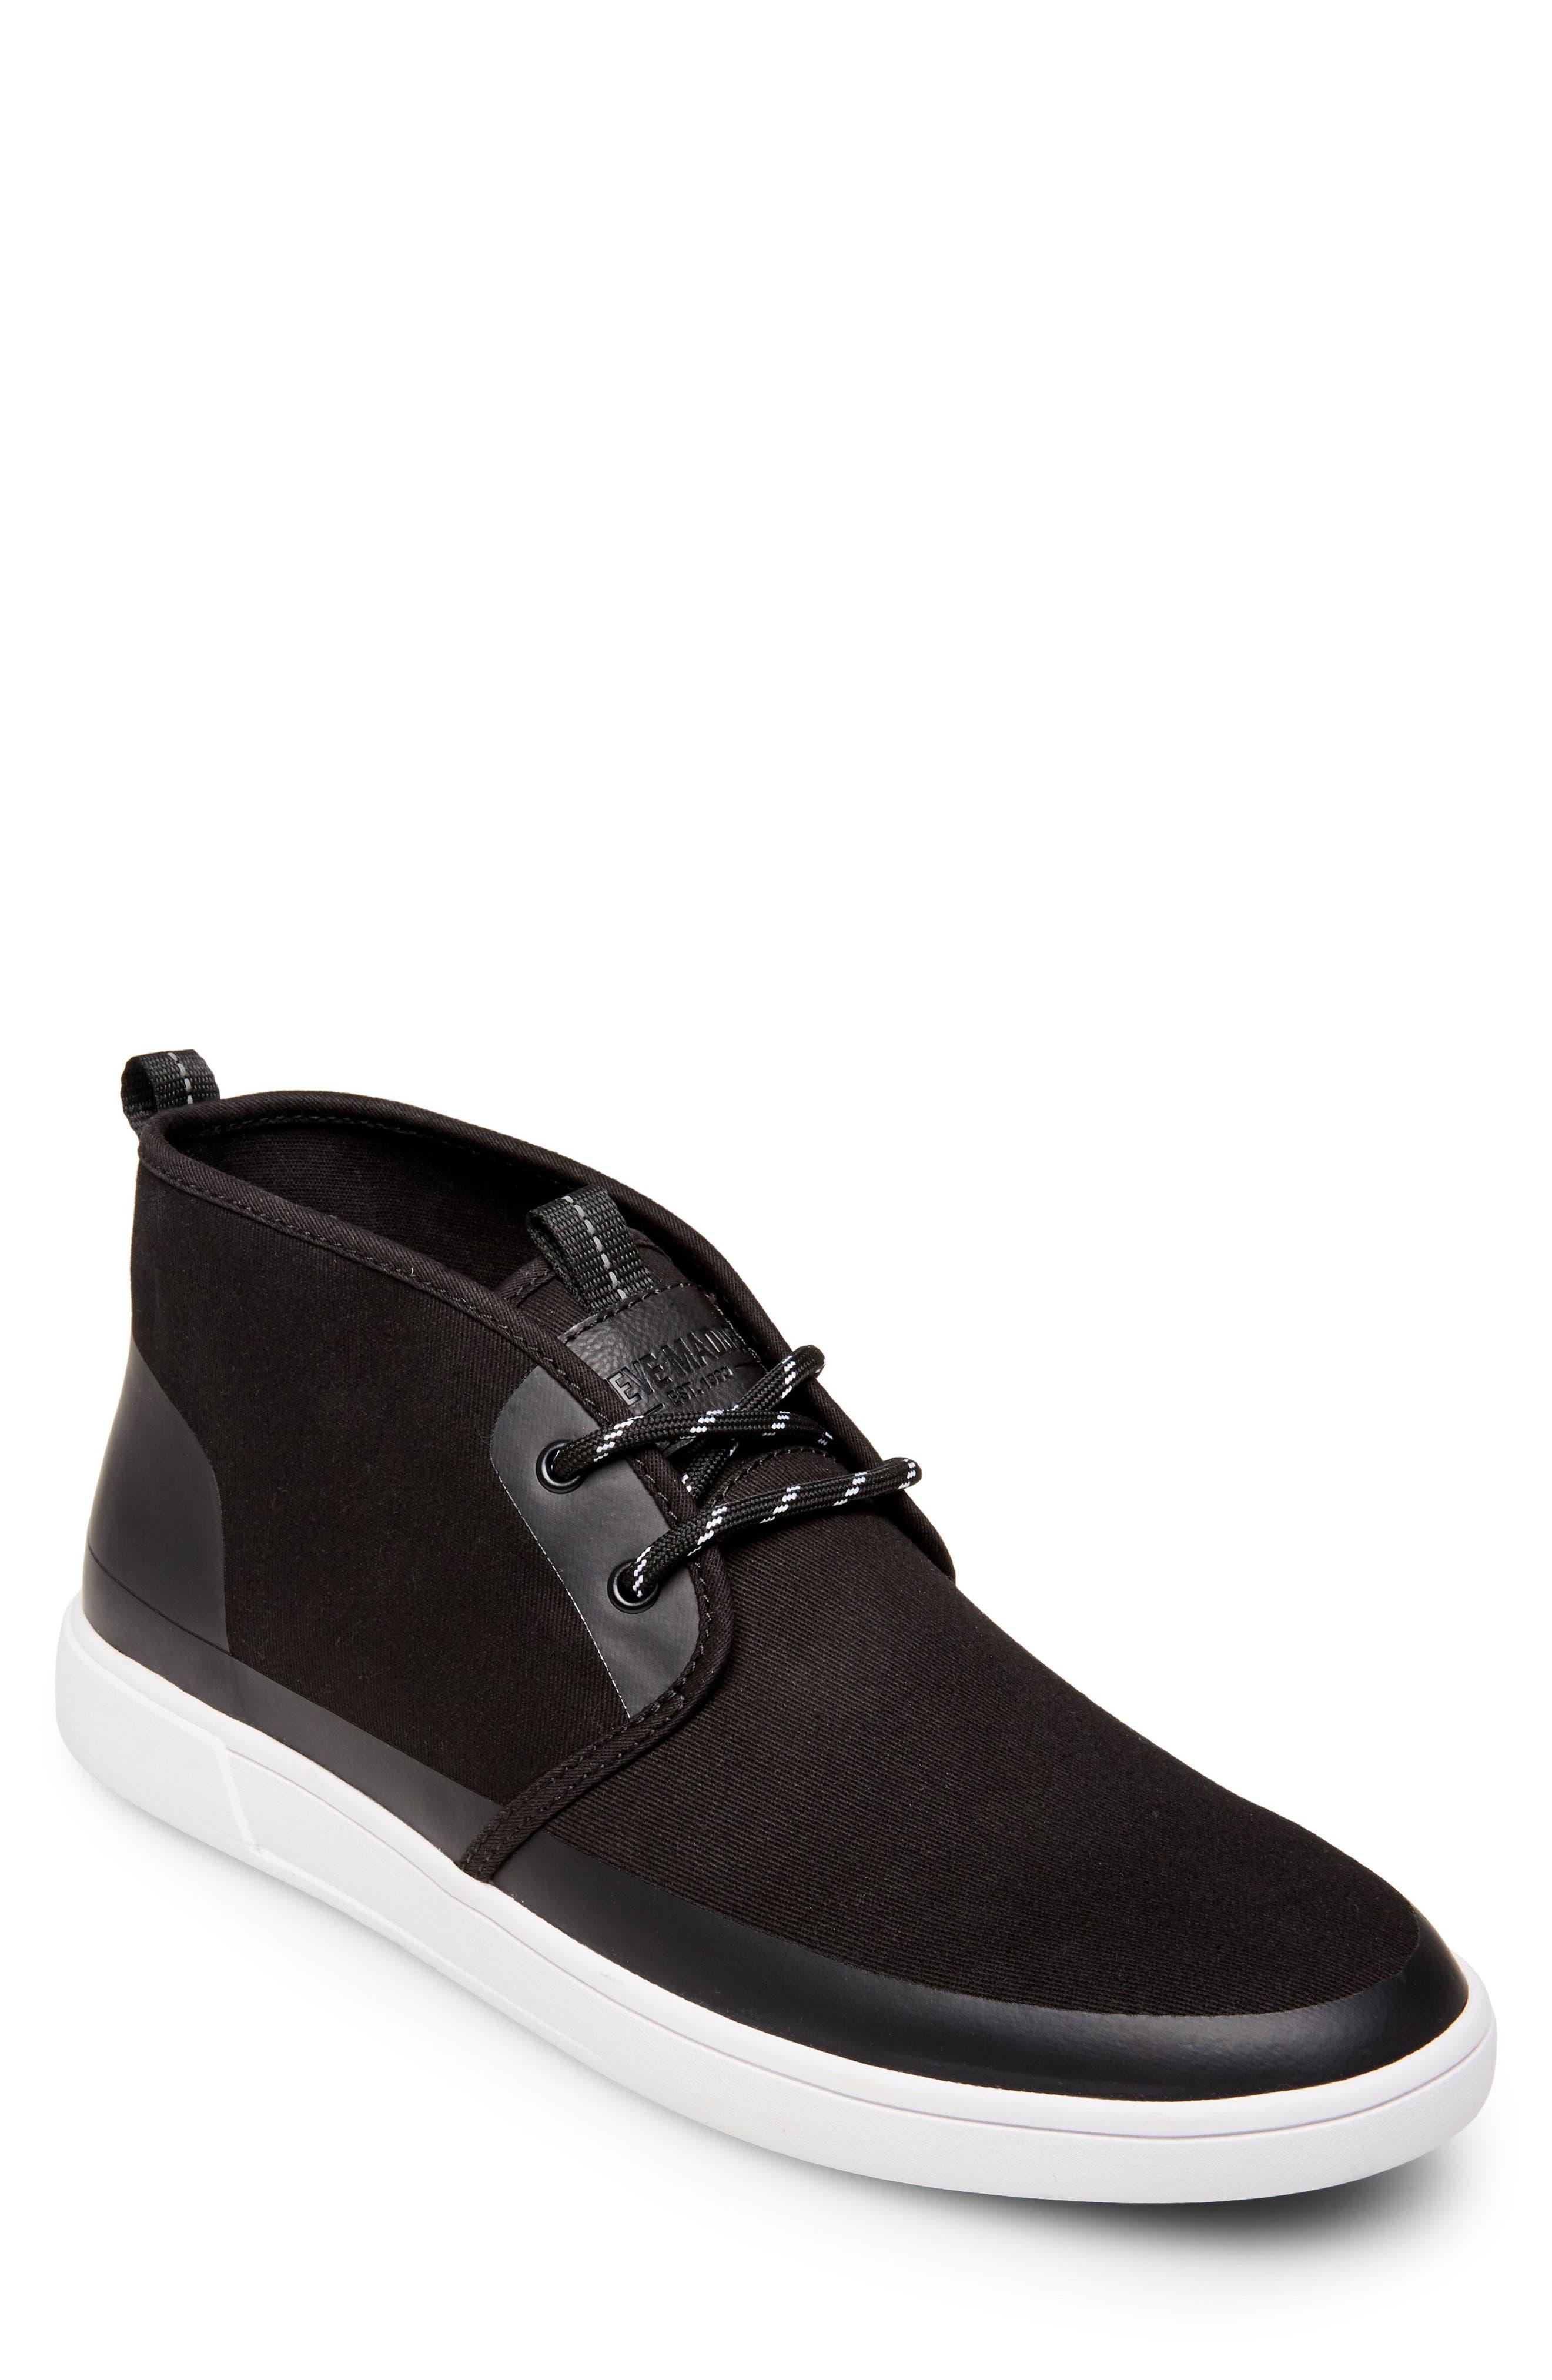 Franklyn Chukka Sneaker,                             Main thumbnail 1, color,                             BLACK FABRIC